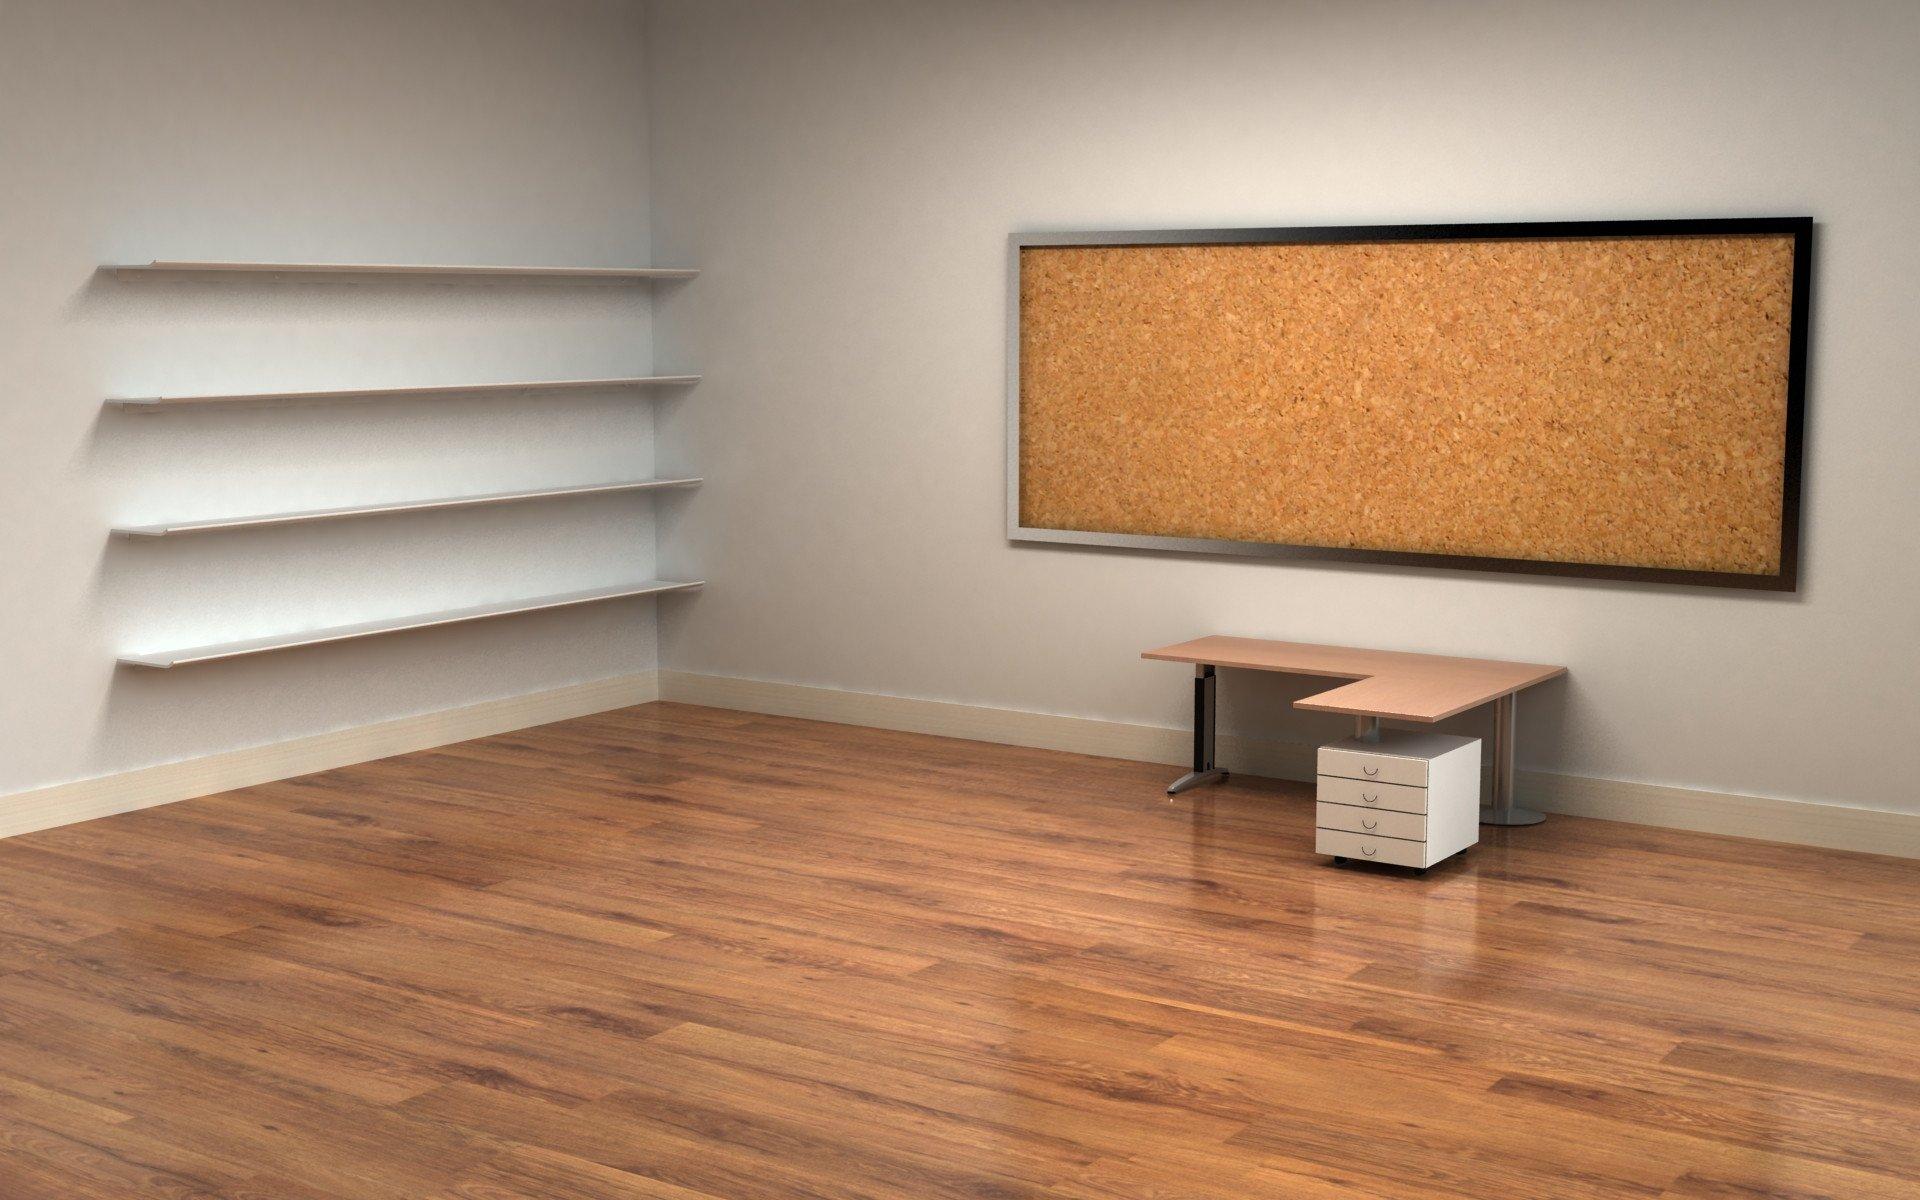 Surprising 49 Desk And Shelves Desktop Wallpaper On Wallpapersafari Interior Design Ideas Philsoteloinfo